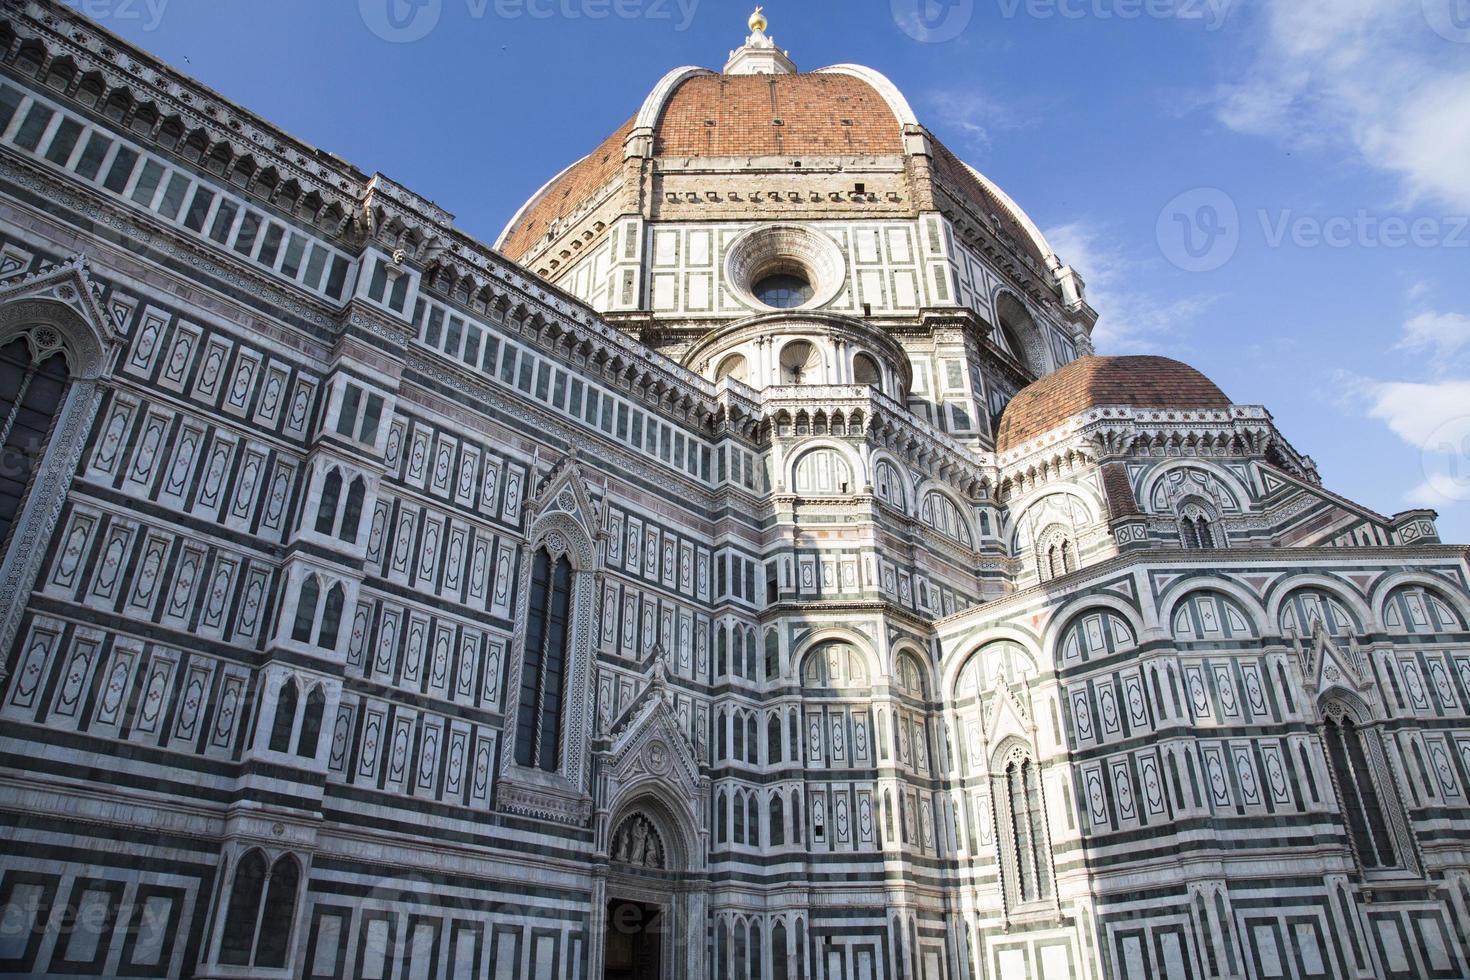 Italy - Florence, Duomo Santa Maria Del Fiore photo